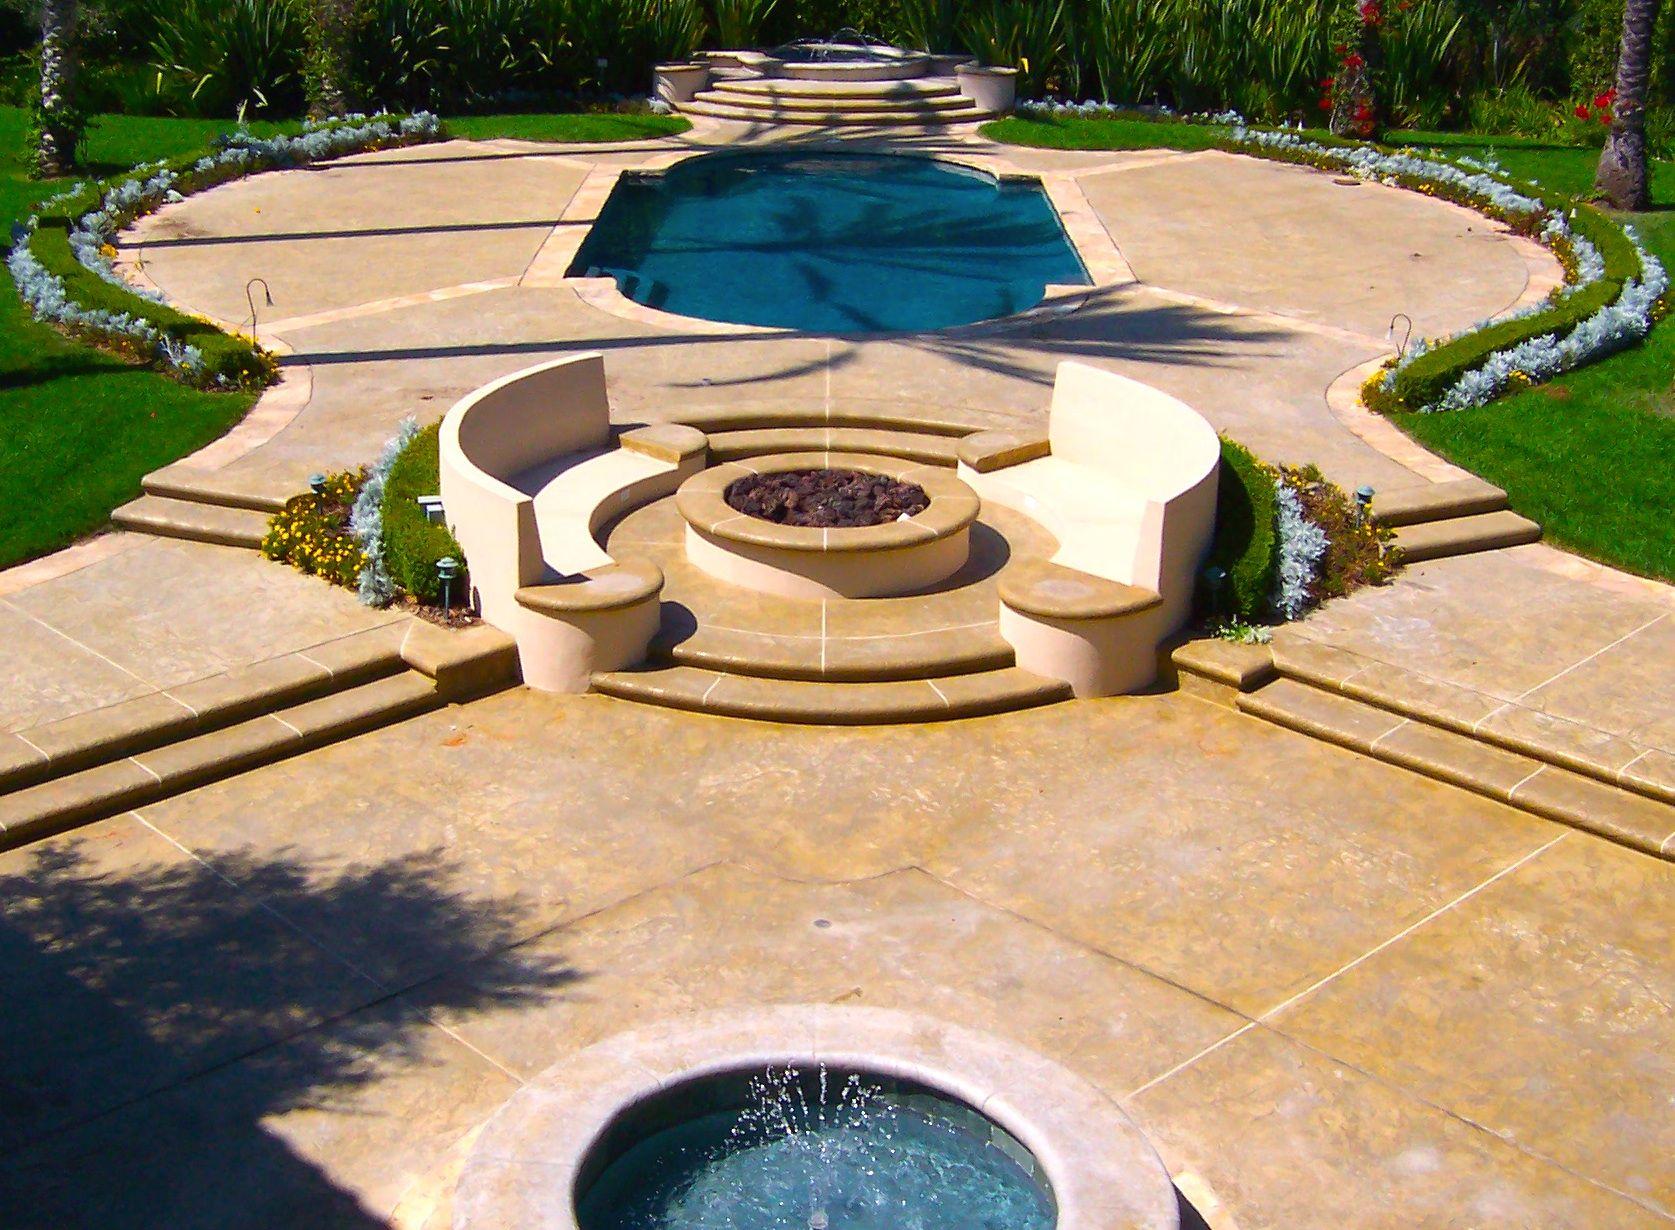 Fabulous Outdoor Fire Pit Designs to Make Cozy Backyard Patio Design ...